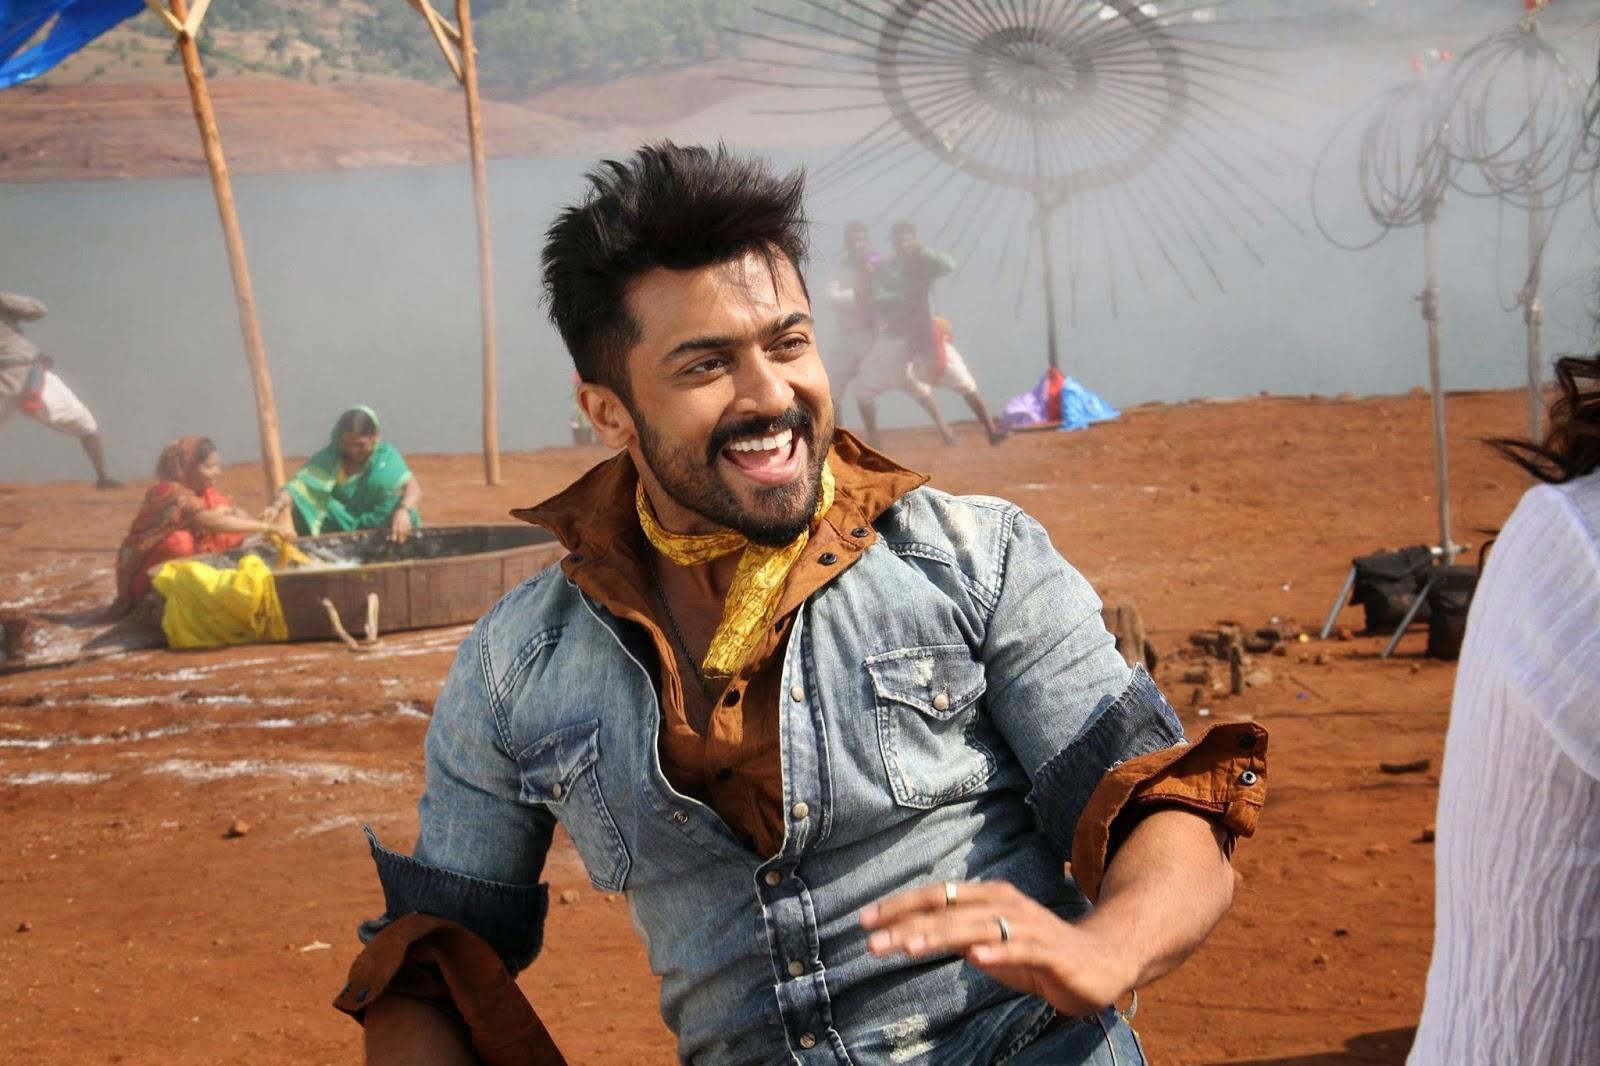 Suriya Movie Stills Photos Wallpapers: Surya SIKINDAR STILLS In HD (WALLPAPERS)